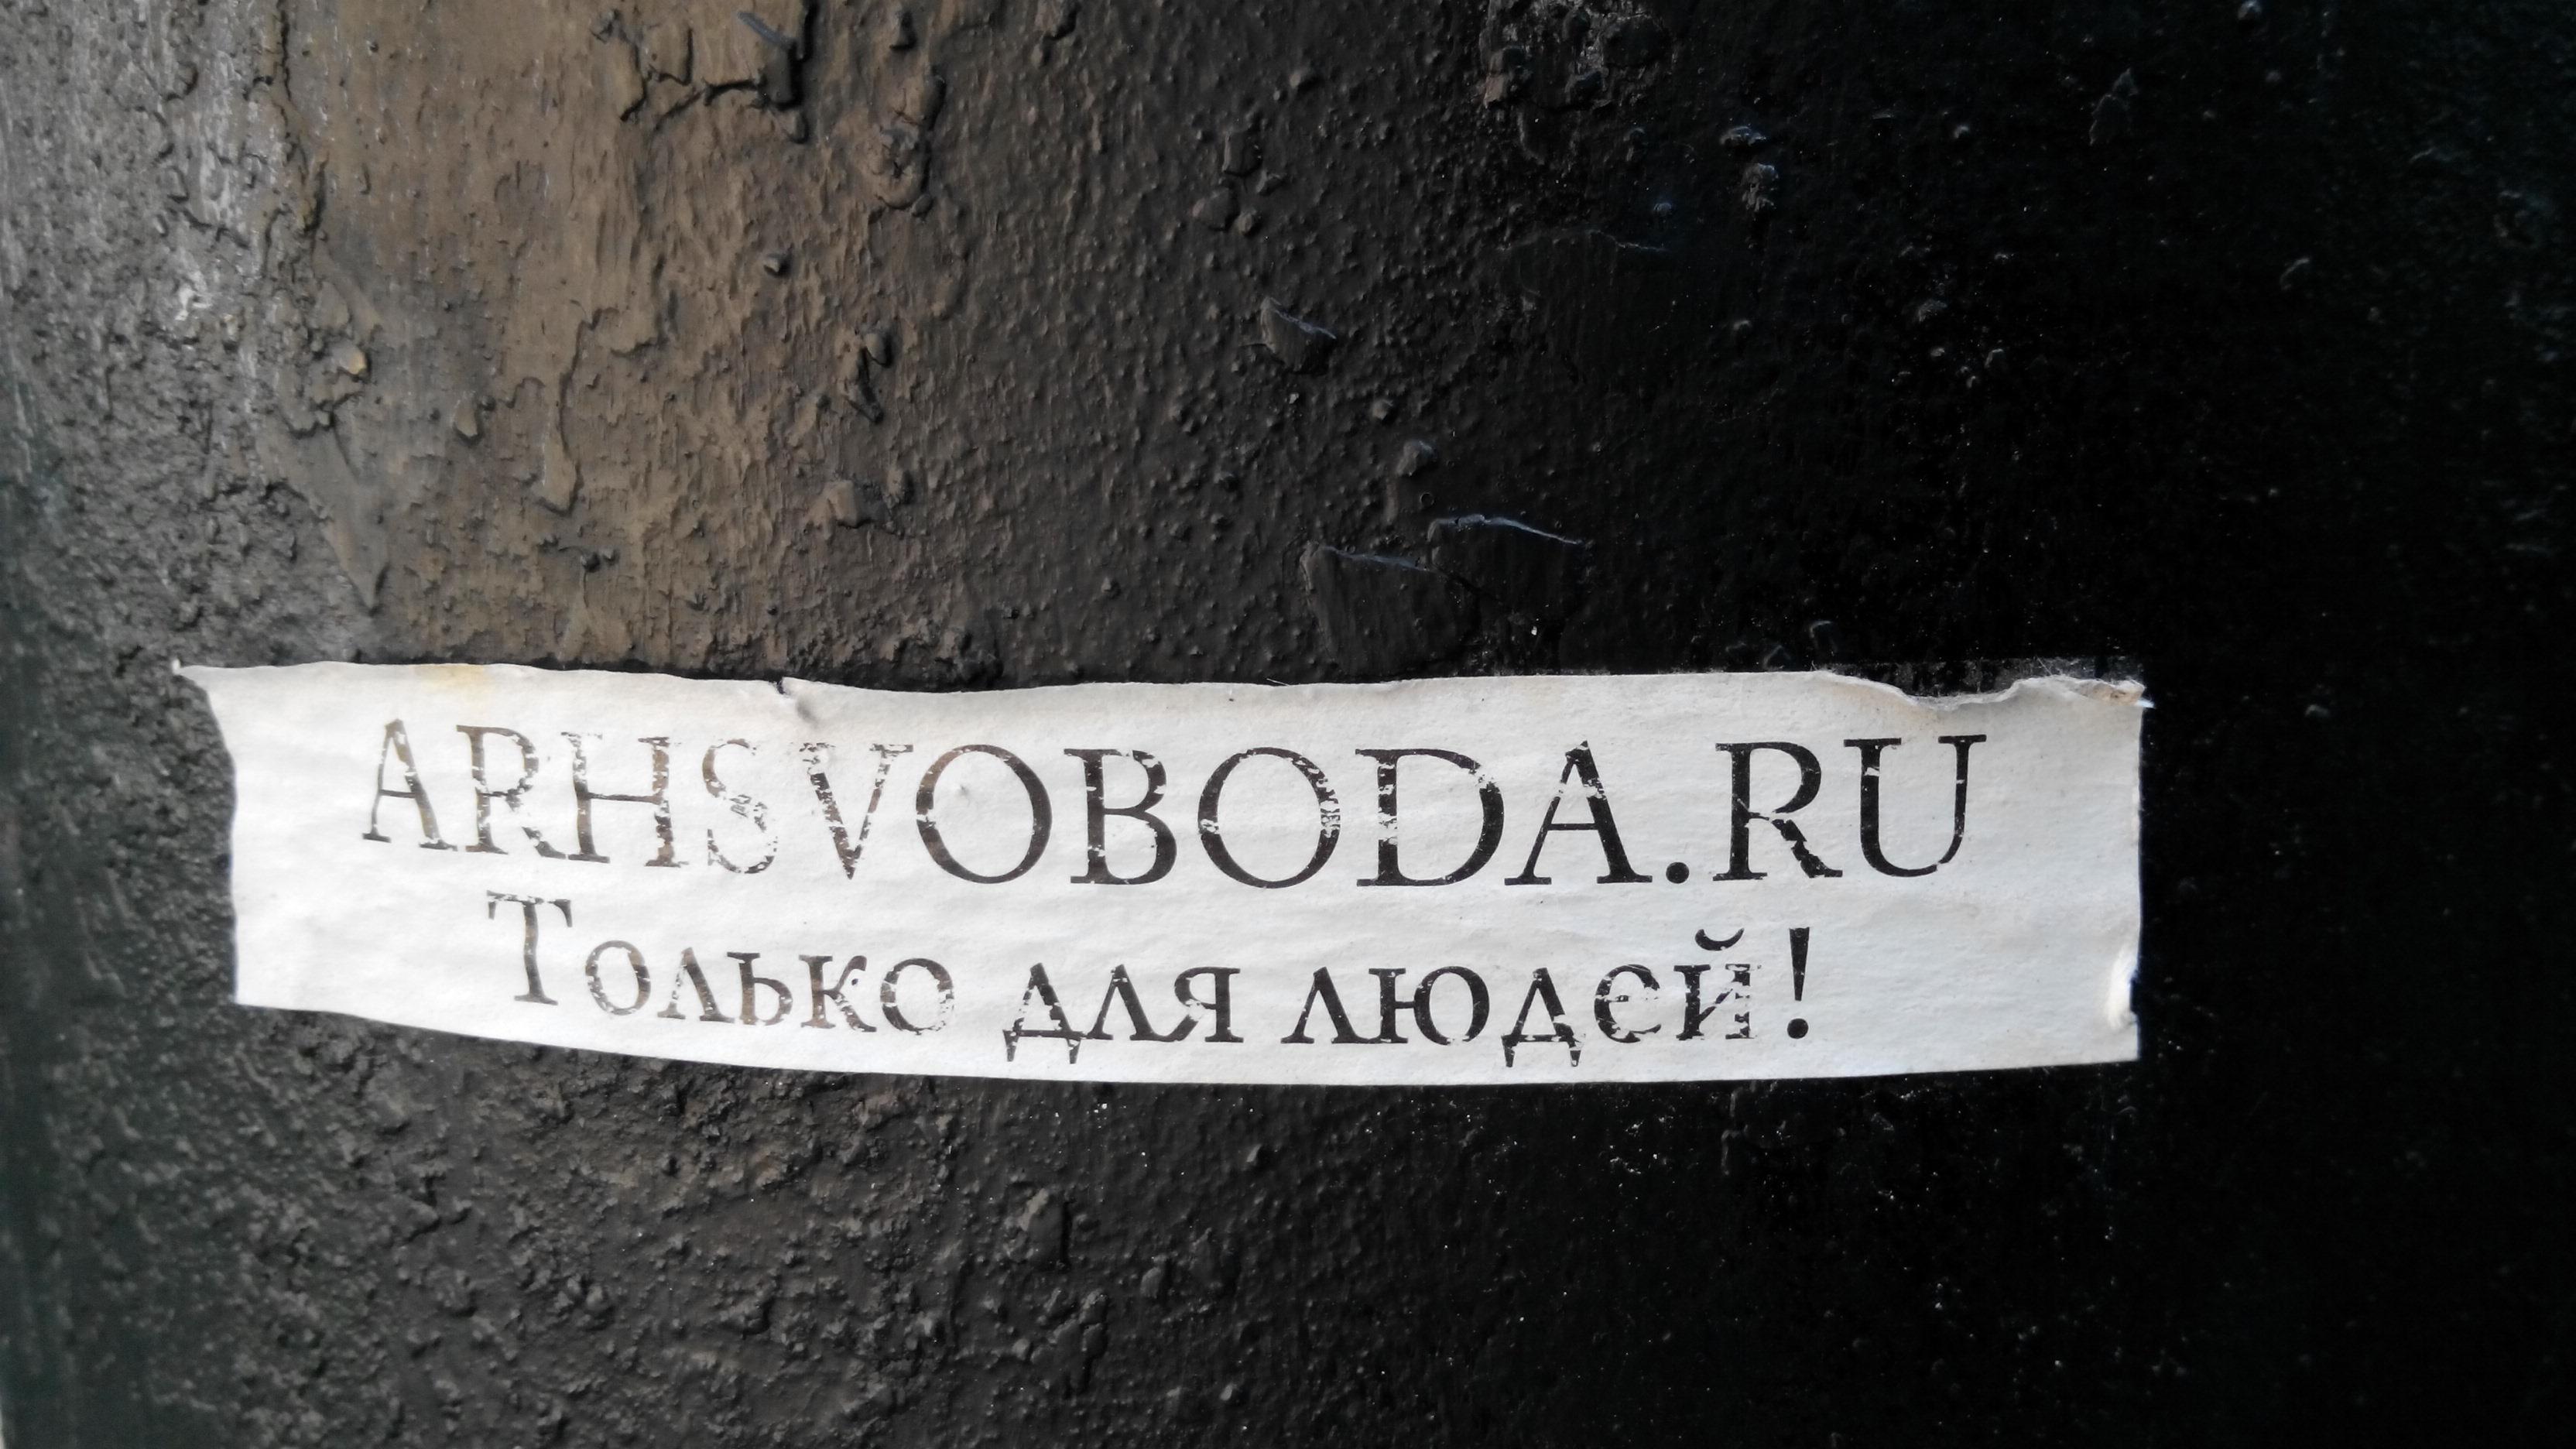 Юрий Андреевич, поклон Вам до земли